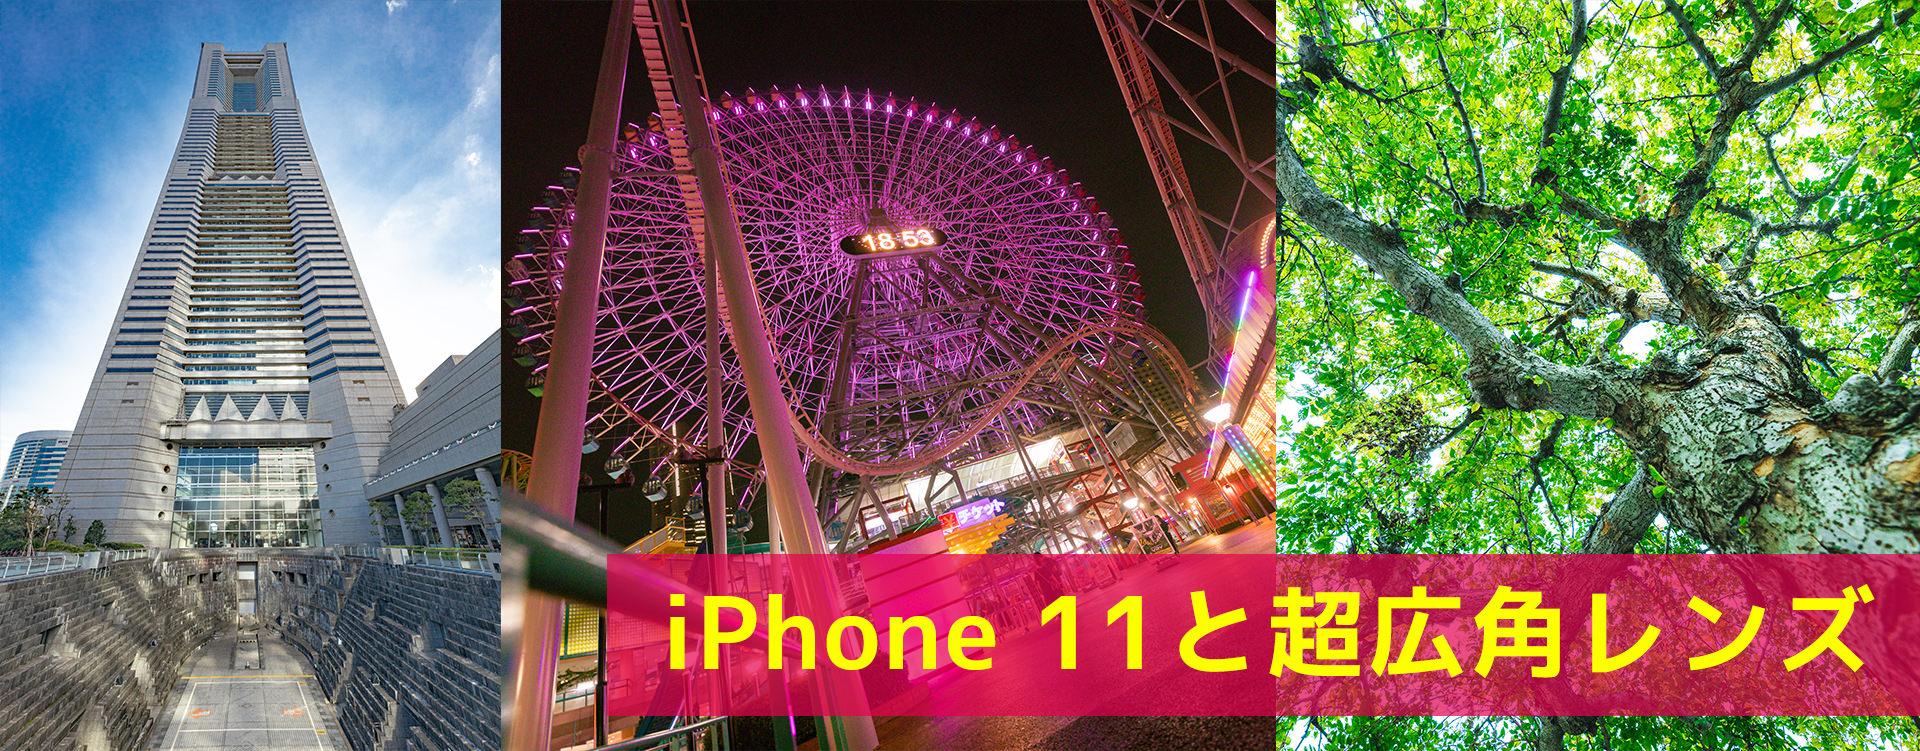 iPhone 11 と超広角レンズの画角とフリー素材